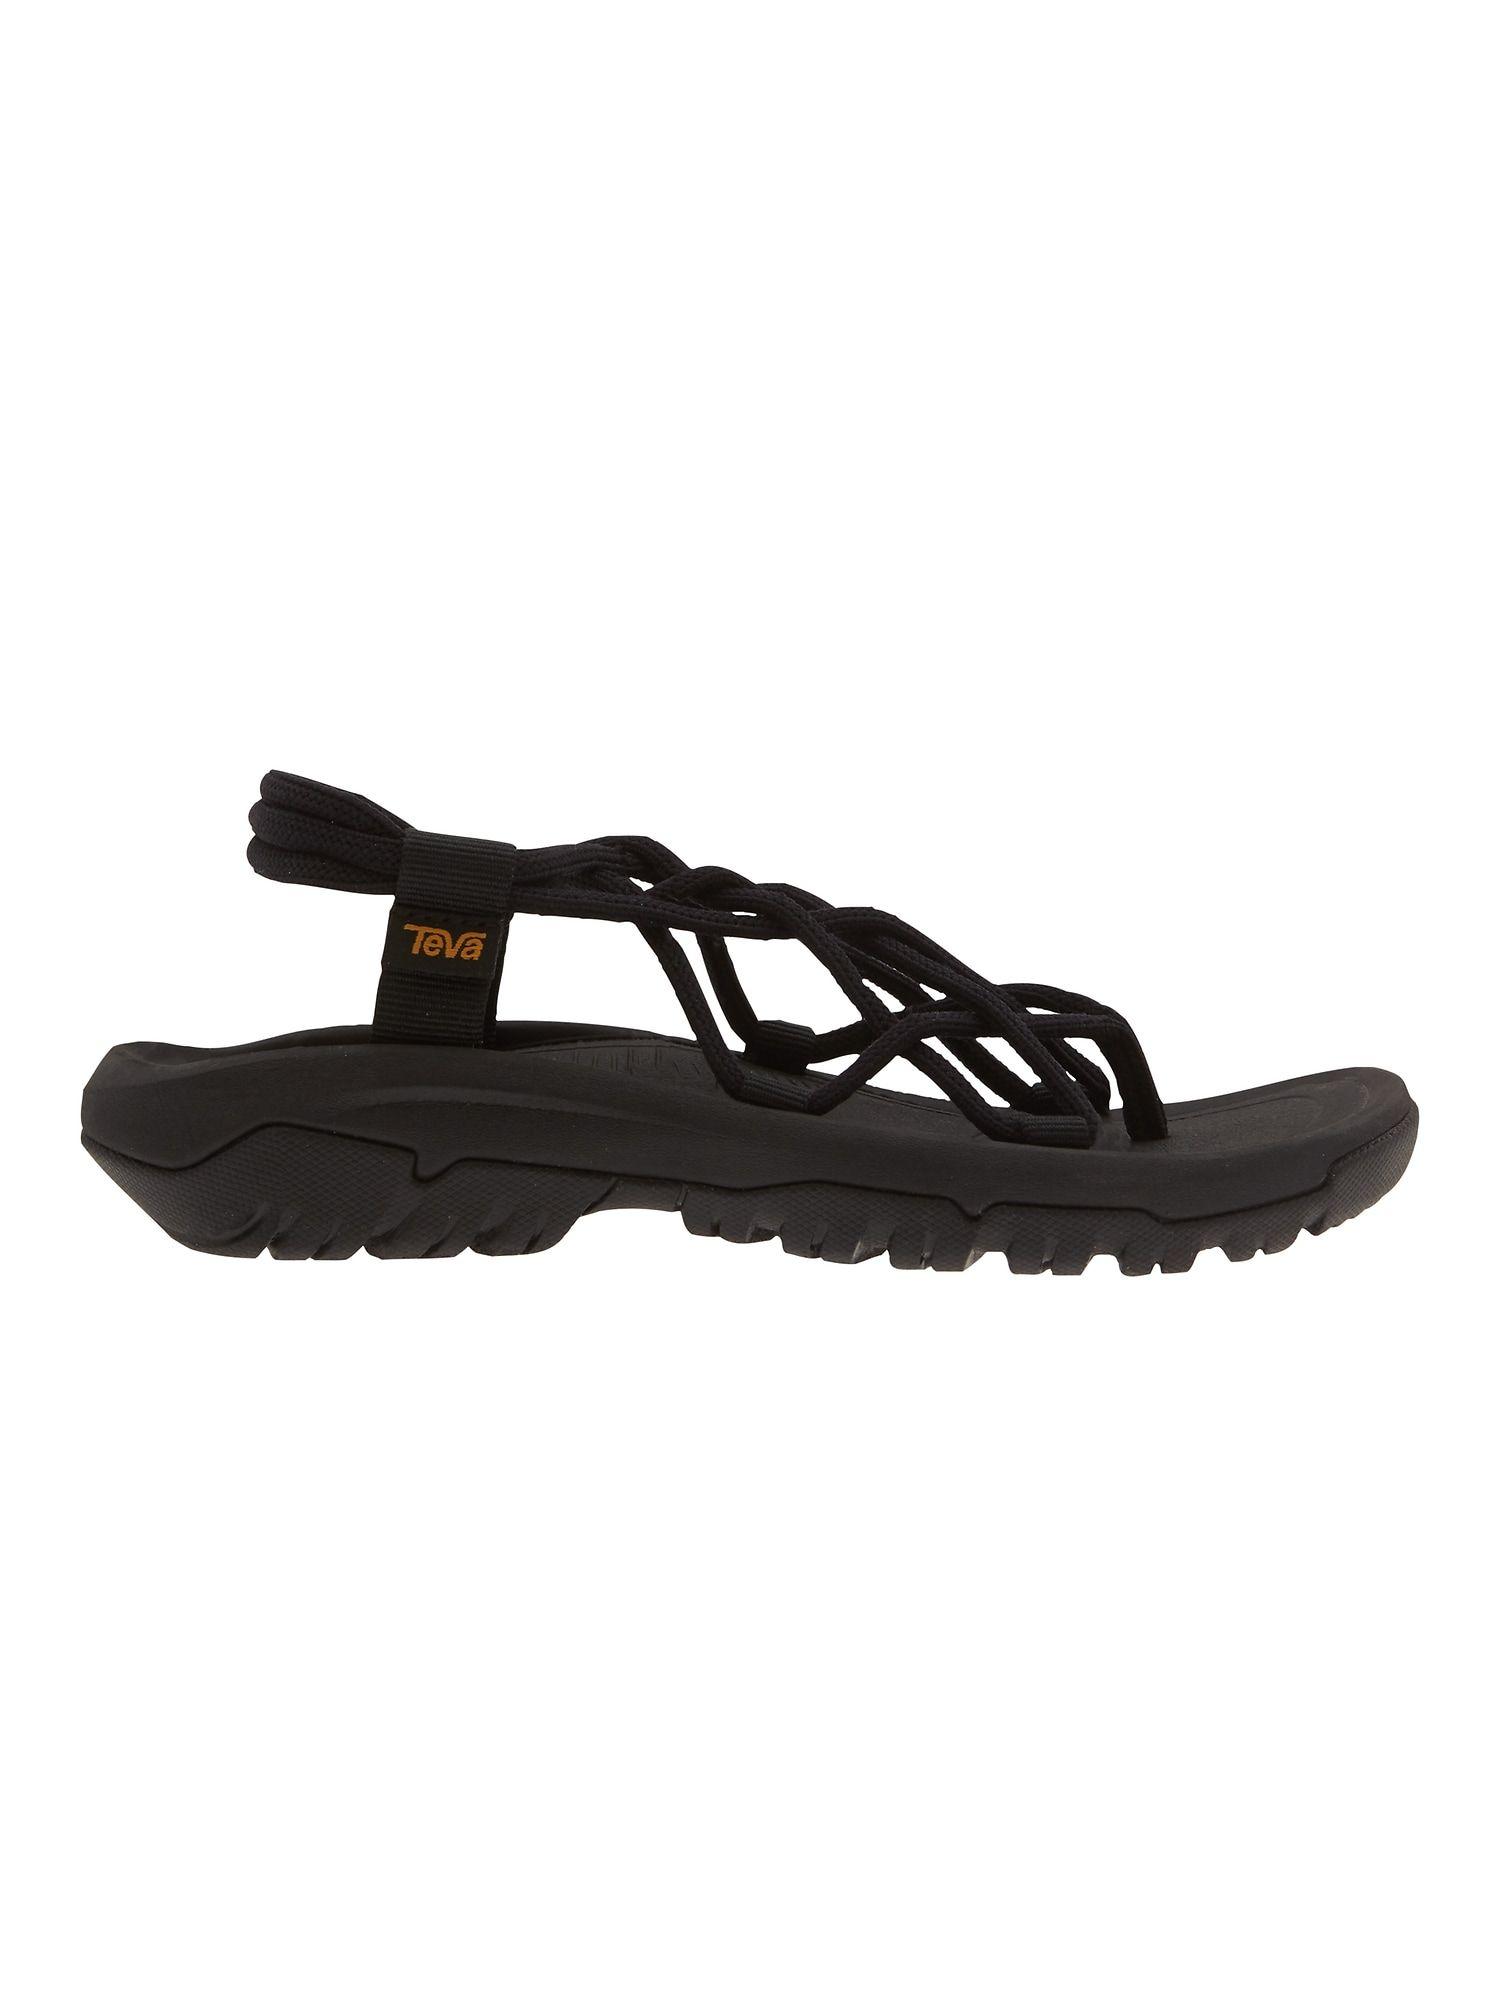 Hurricane Xlt Infinity Sandal By Teva Athleta In 2020 Teva Athleta Sandals